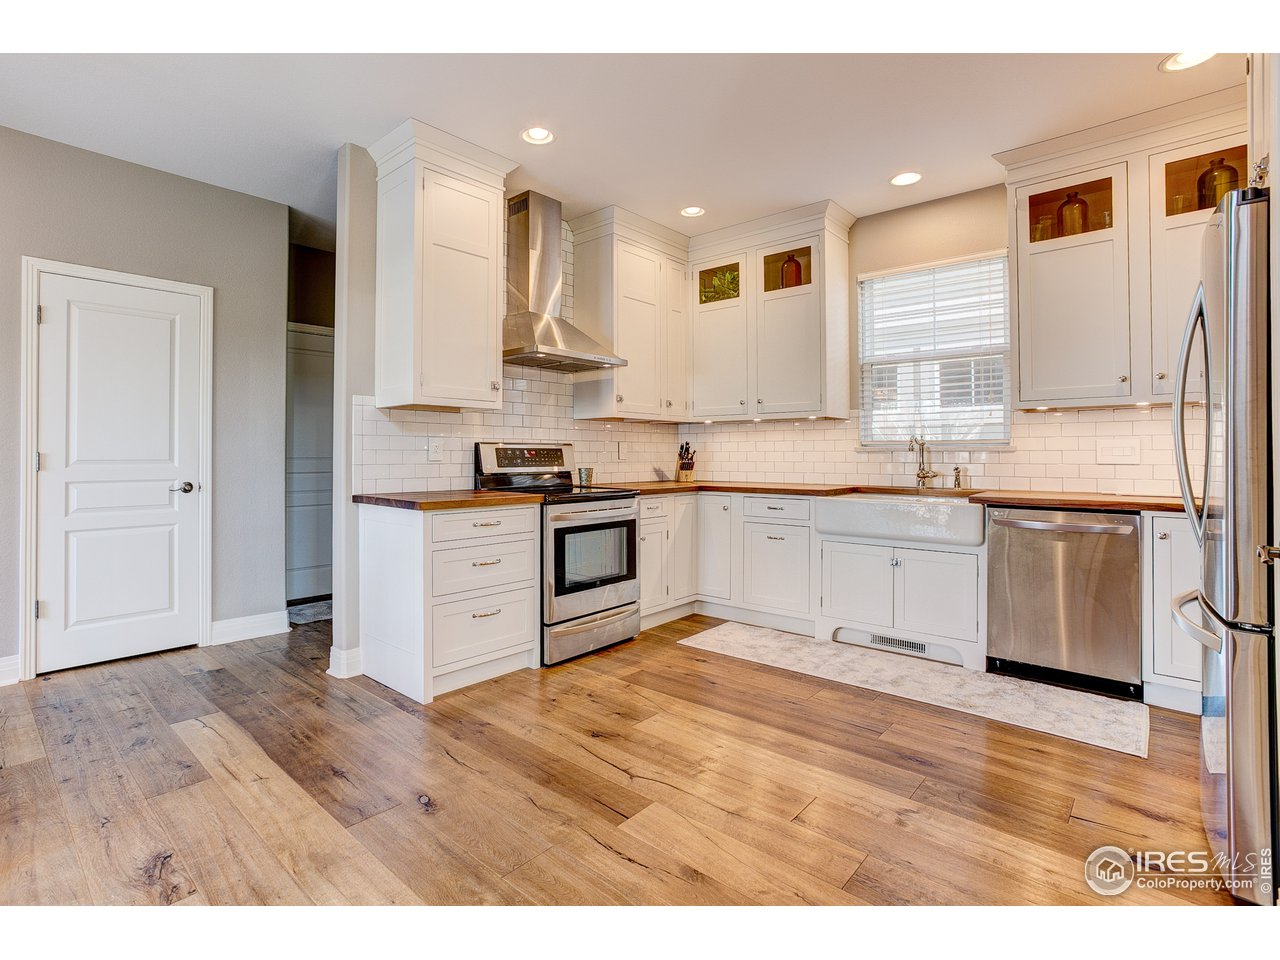 Gorgeous remodeled kitchen